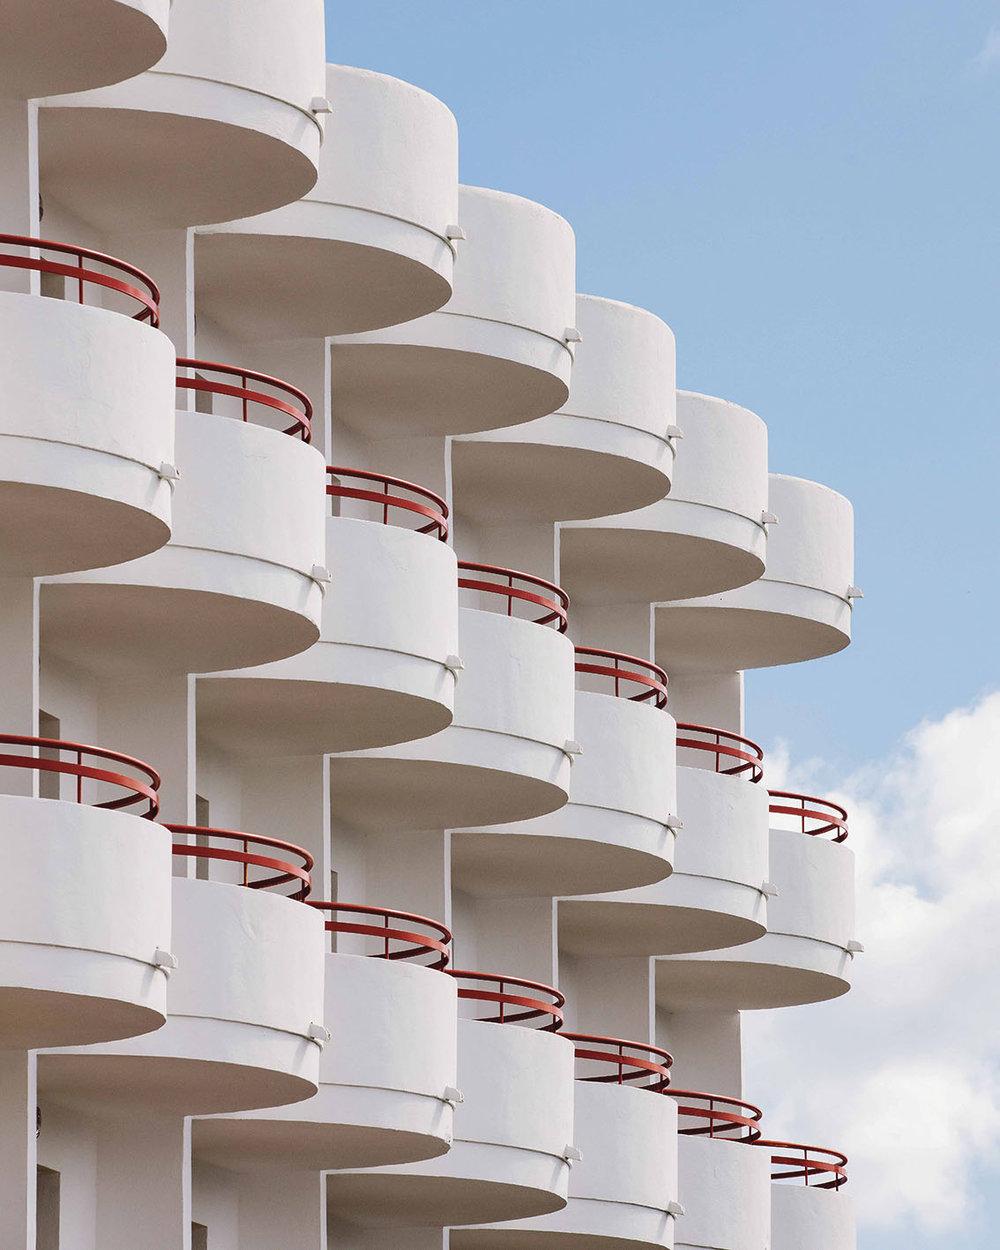 yosigo_arquitectura8.jpg